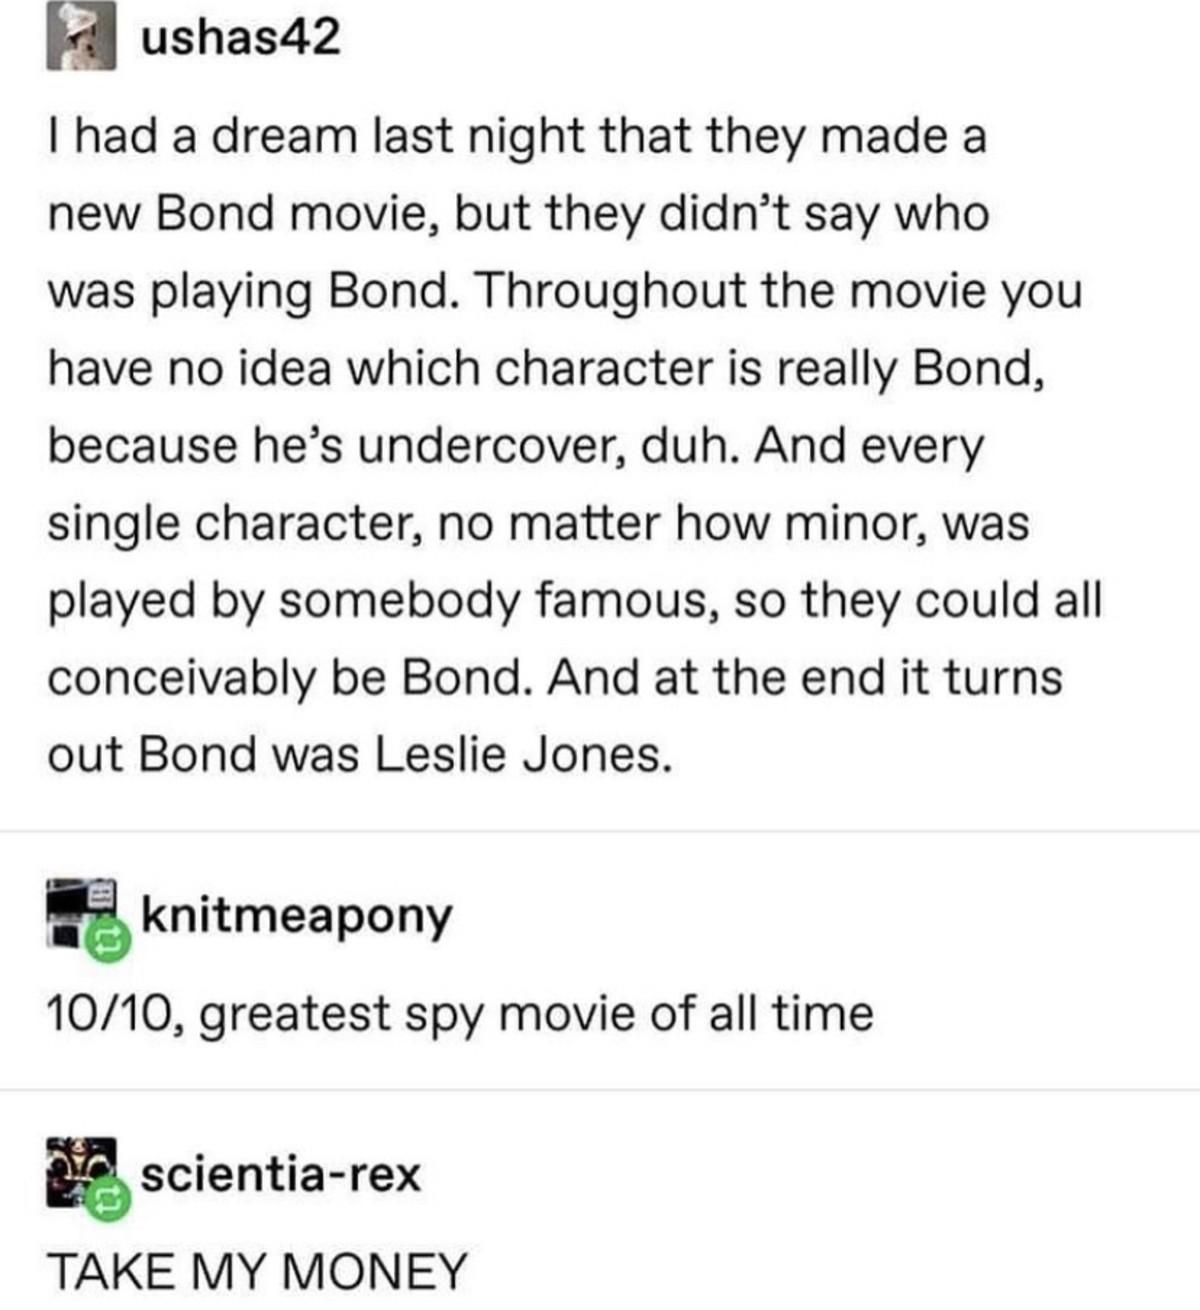 Bond James Bond. .. If it was Leslie Nielsen instead of Leslie Jones, I'd be happy.